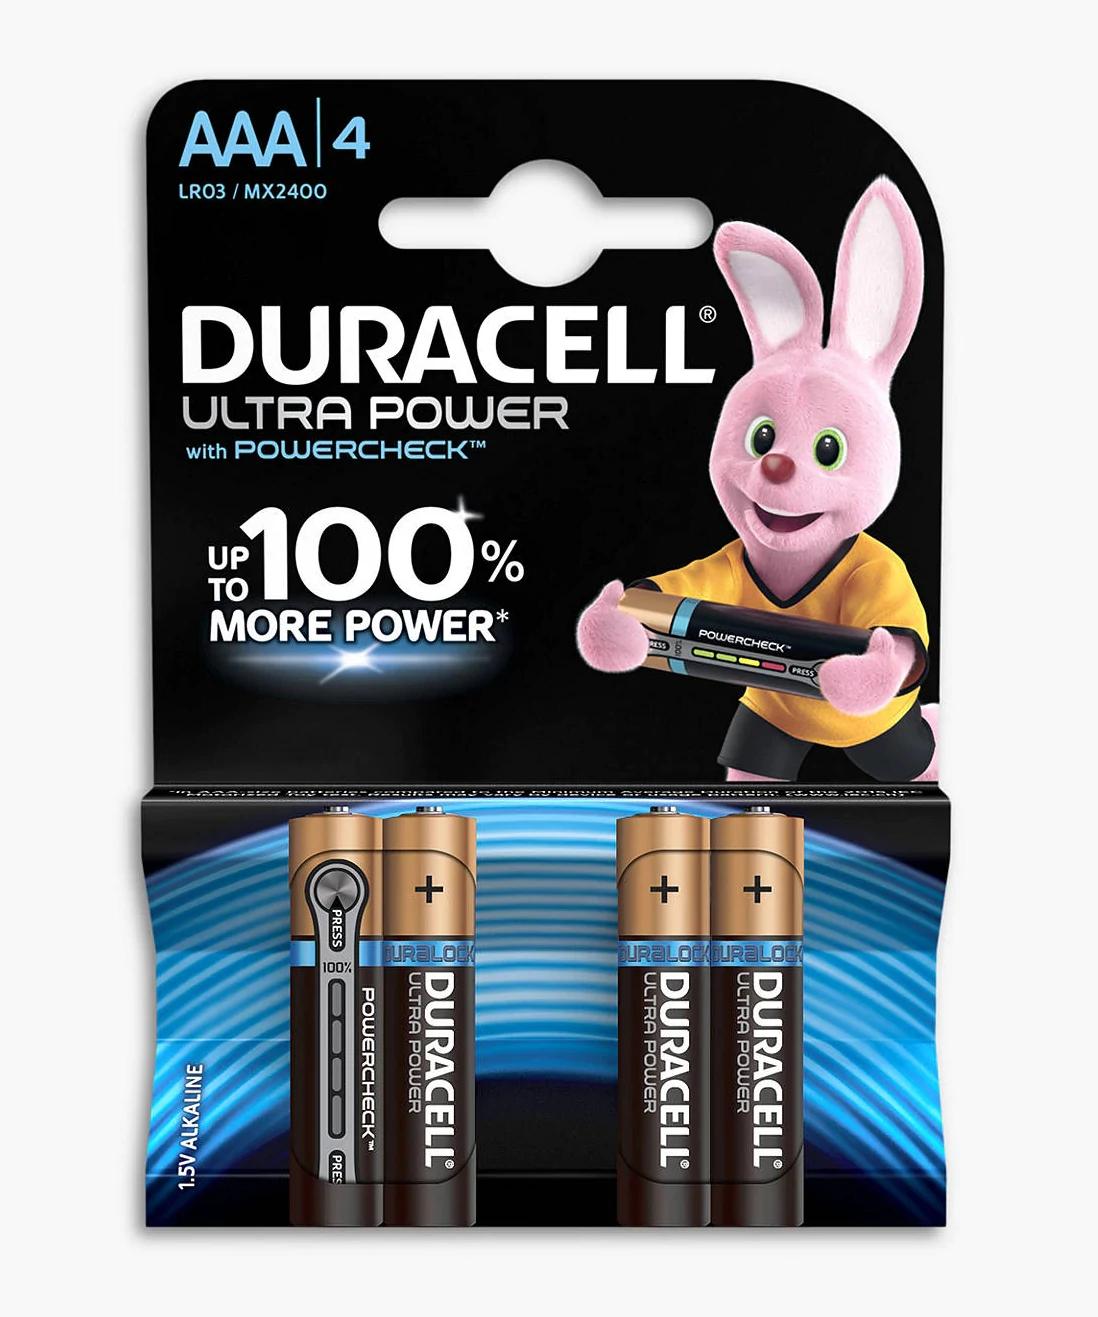 Duracell Ultra Power 1.5V Alkaline AAA Batteries, Pack of 4 for 99p @ John Lewis & Partners (instore / c&c £2)